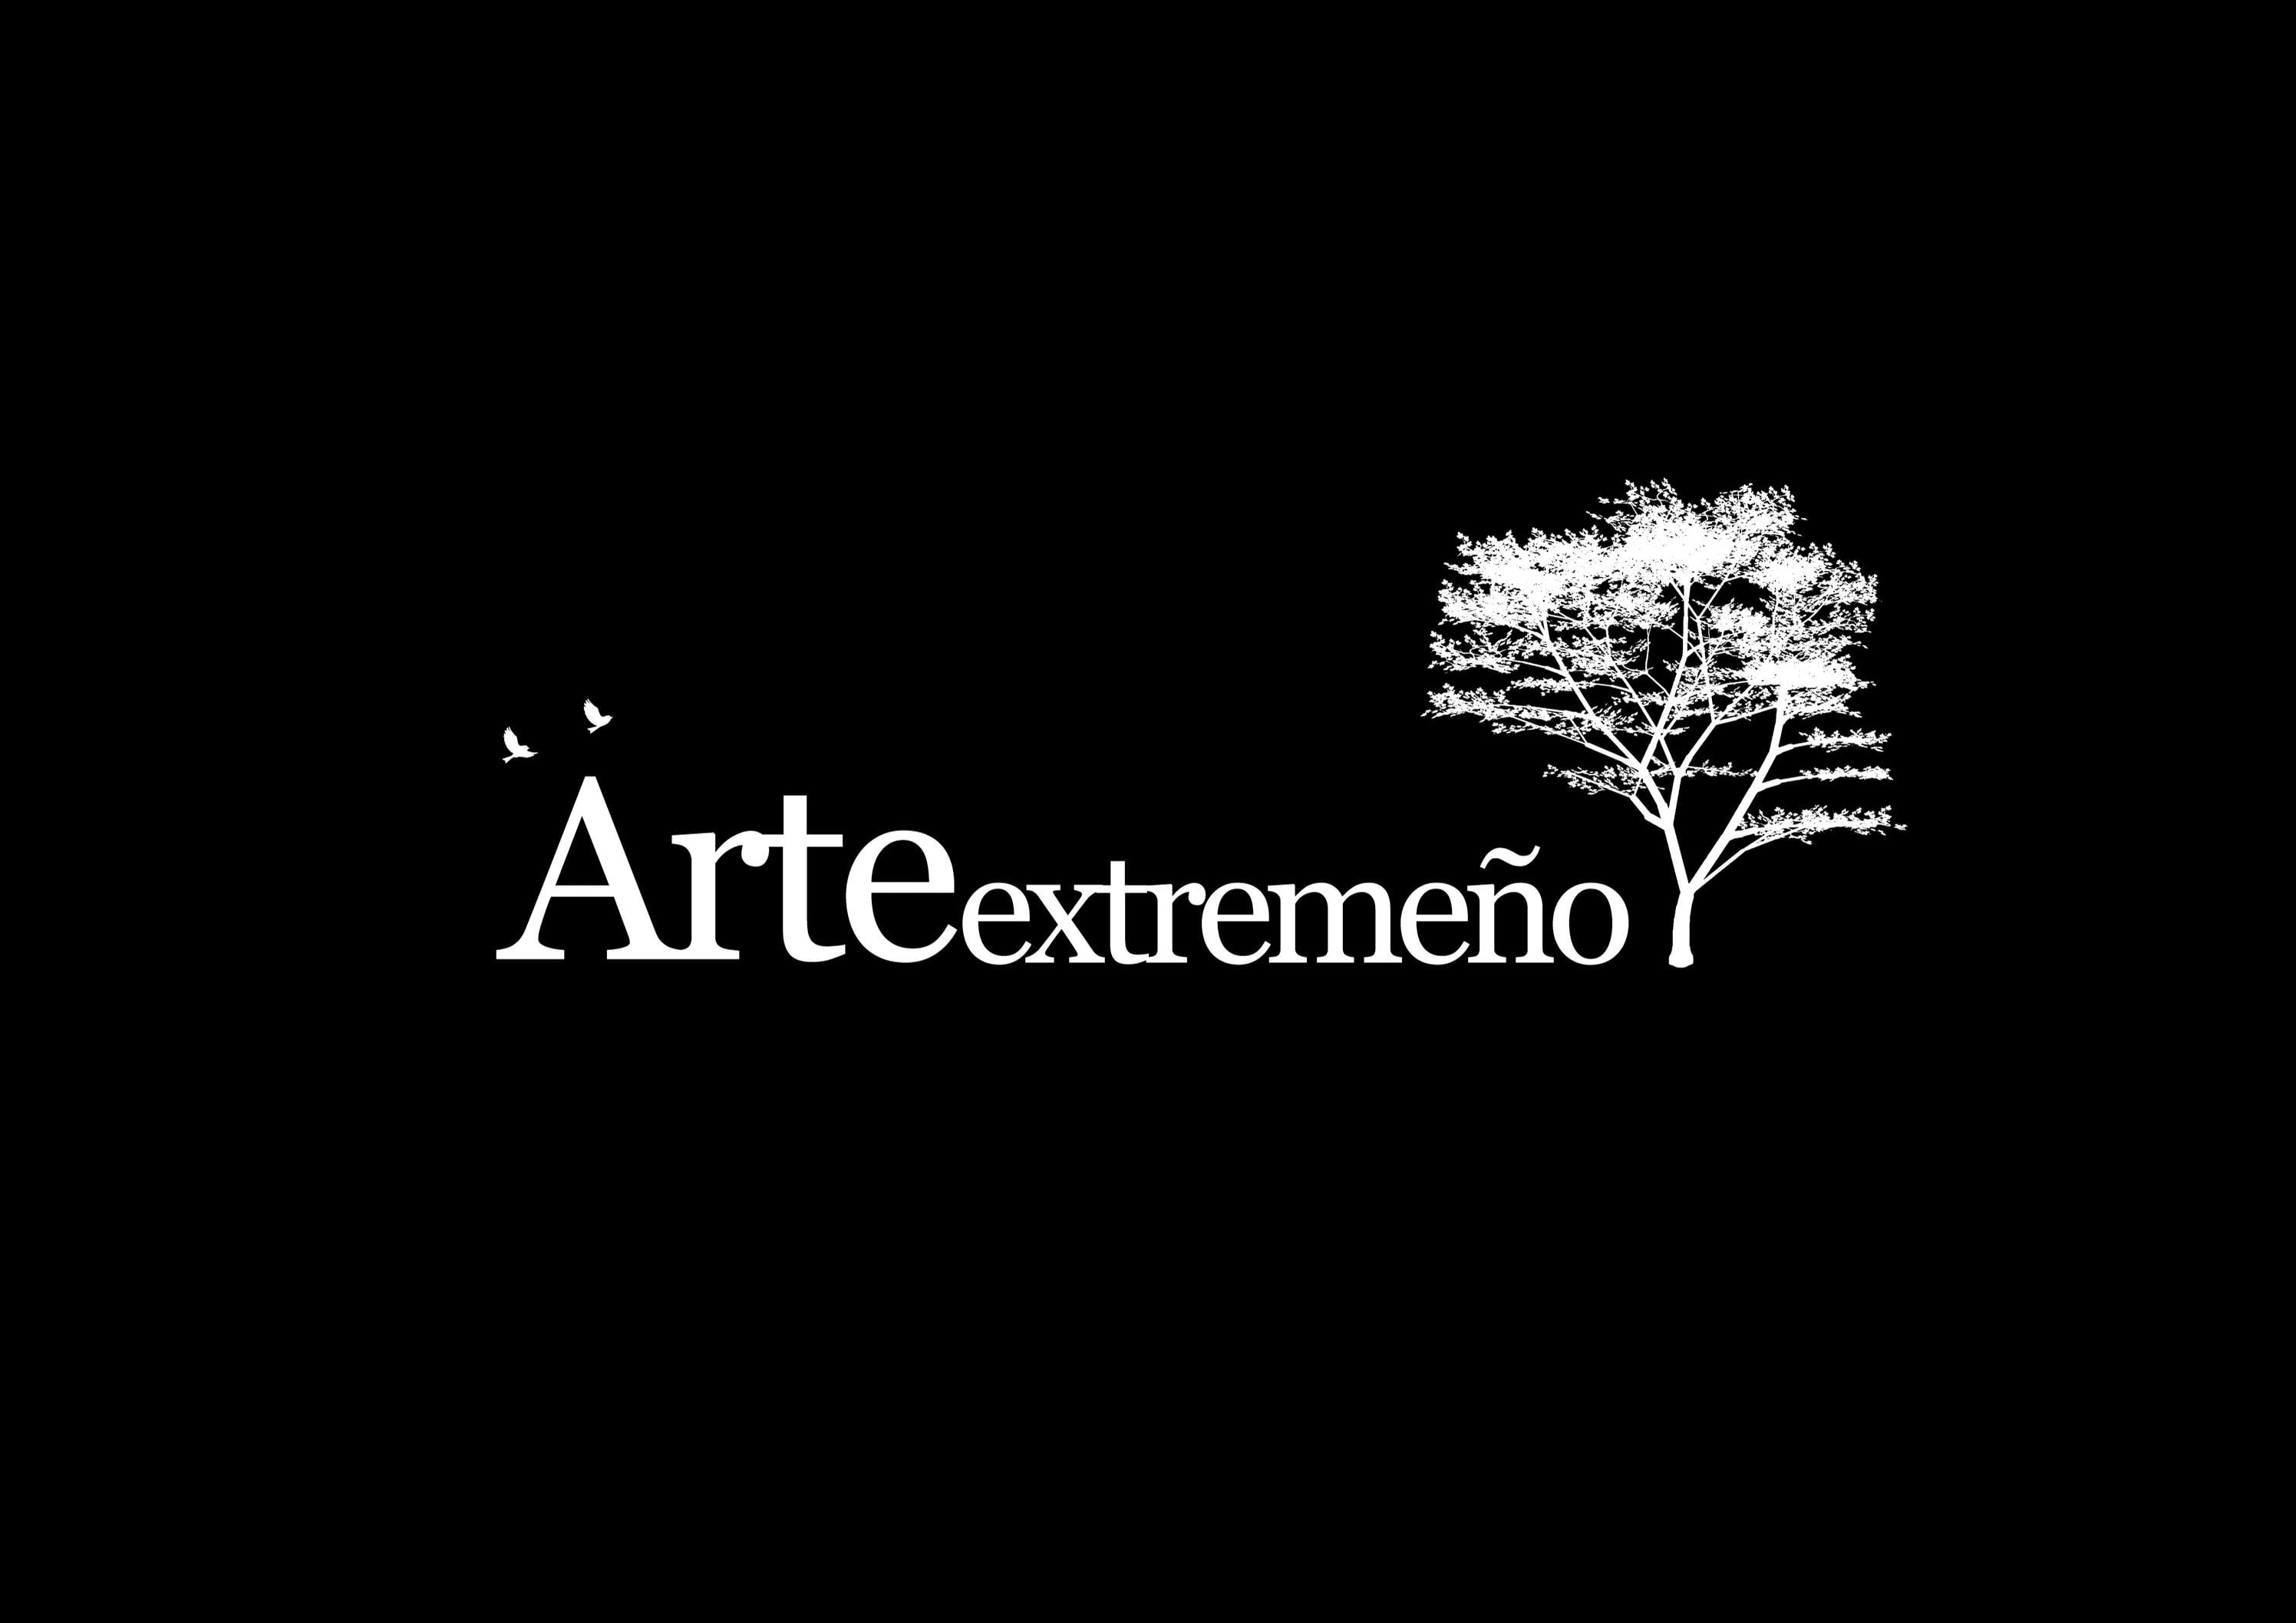 Arteextremeño.es